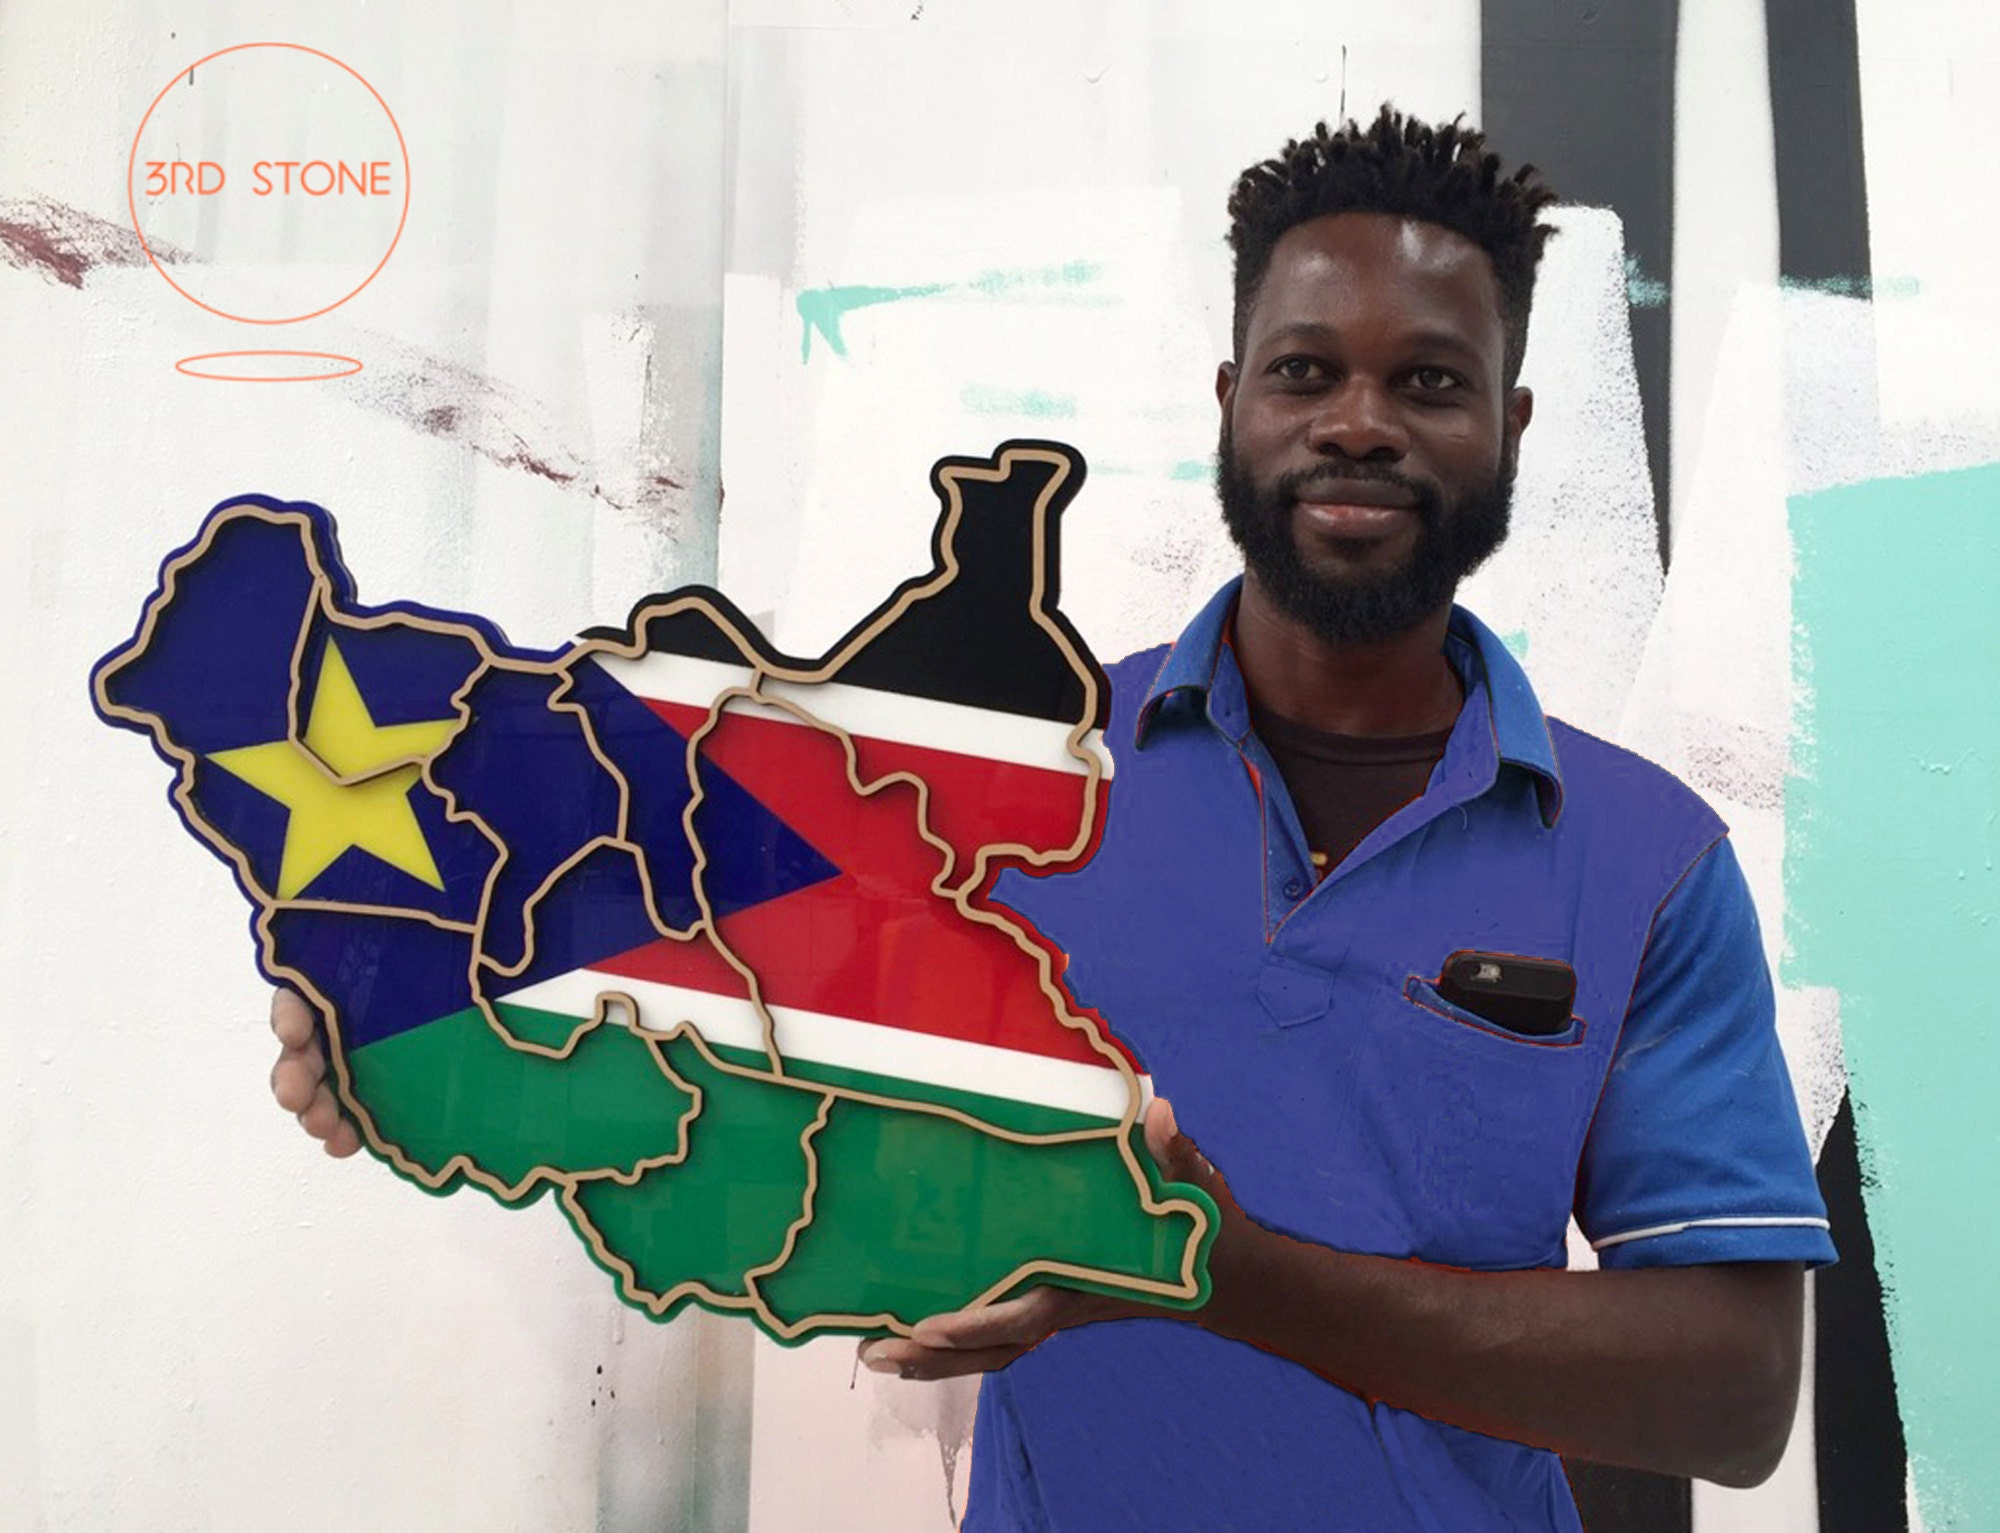 South Sudan map / flag combination